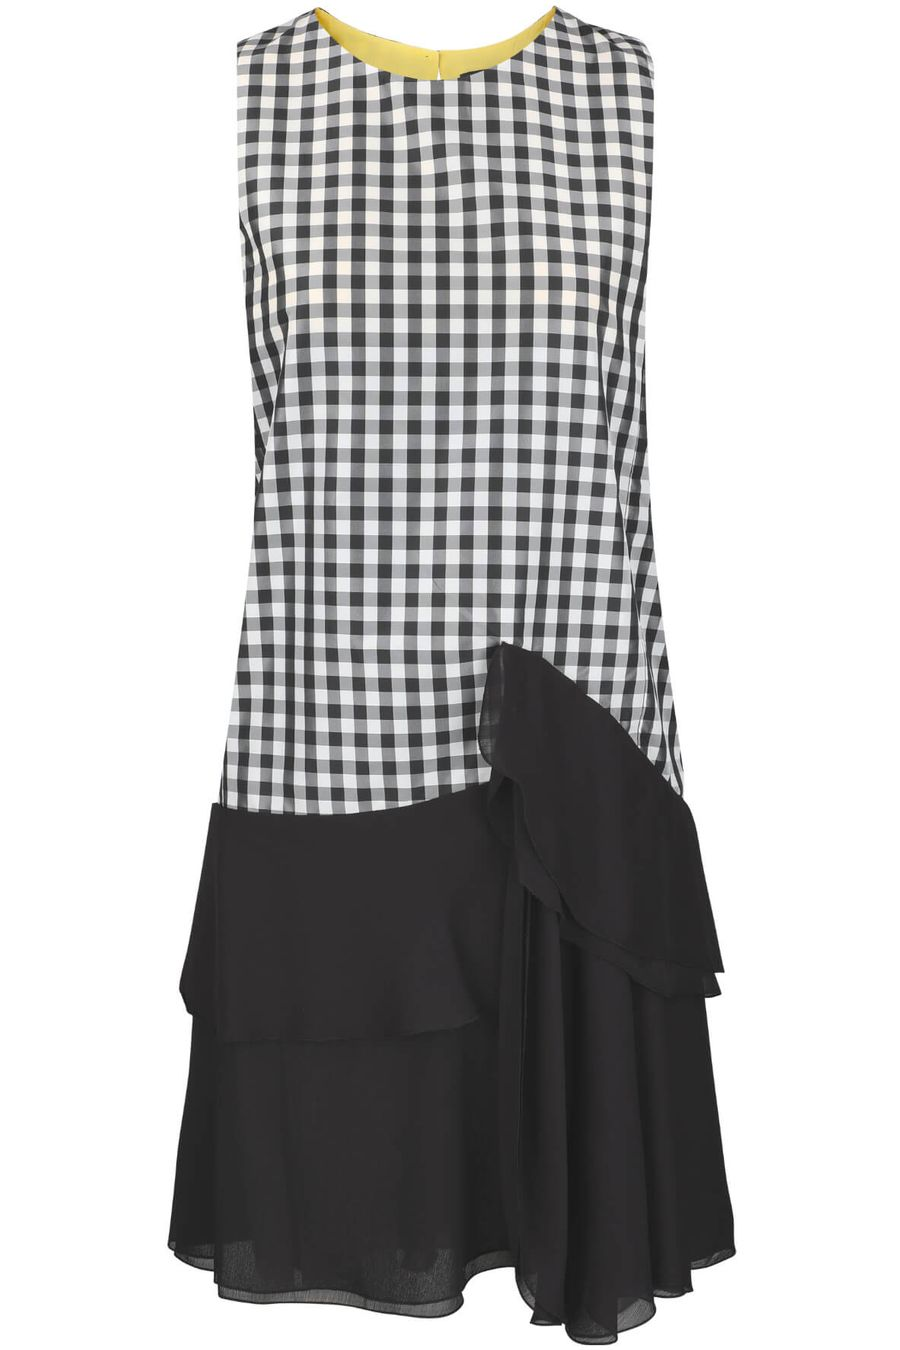 ark-istanbul-gingham-print-shift-dress-1